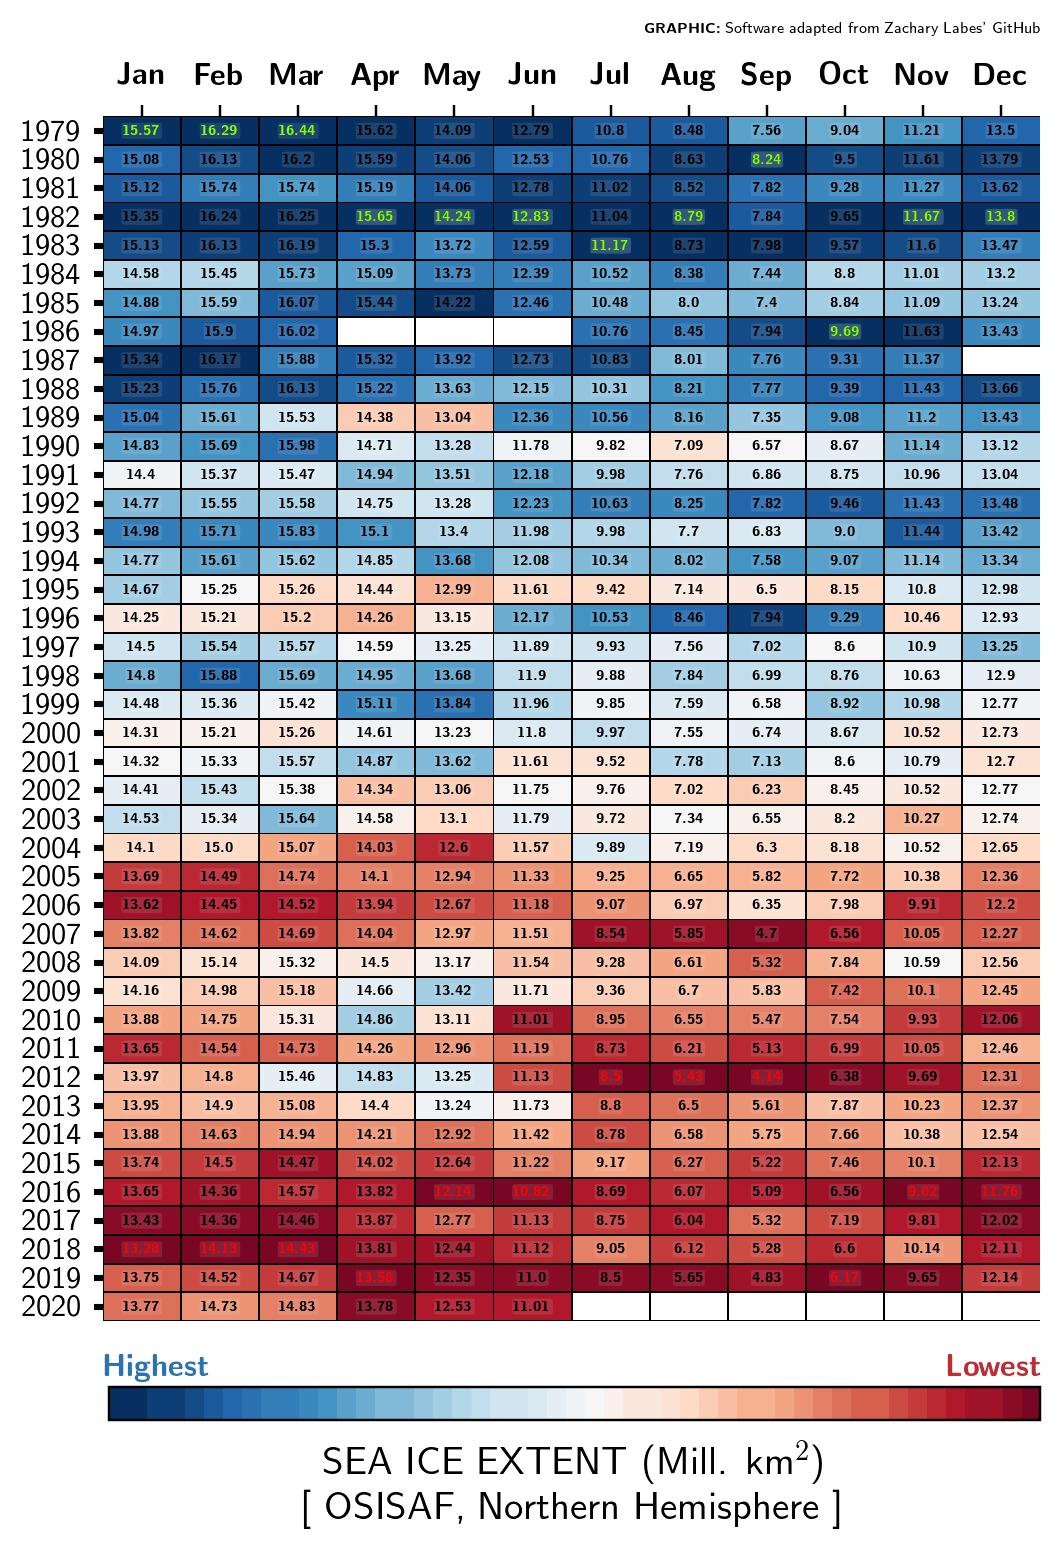 Arctic ice monthly values